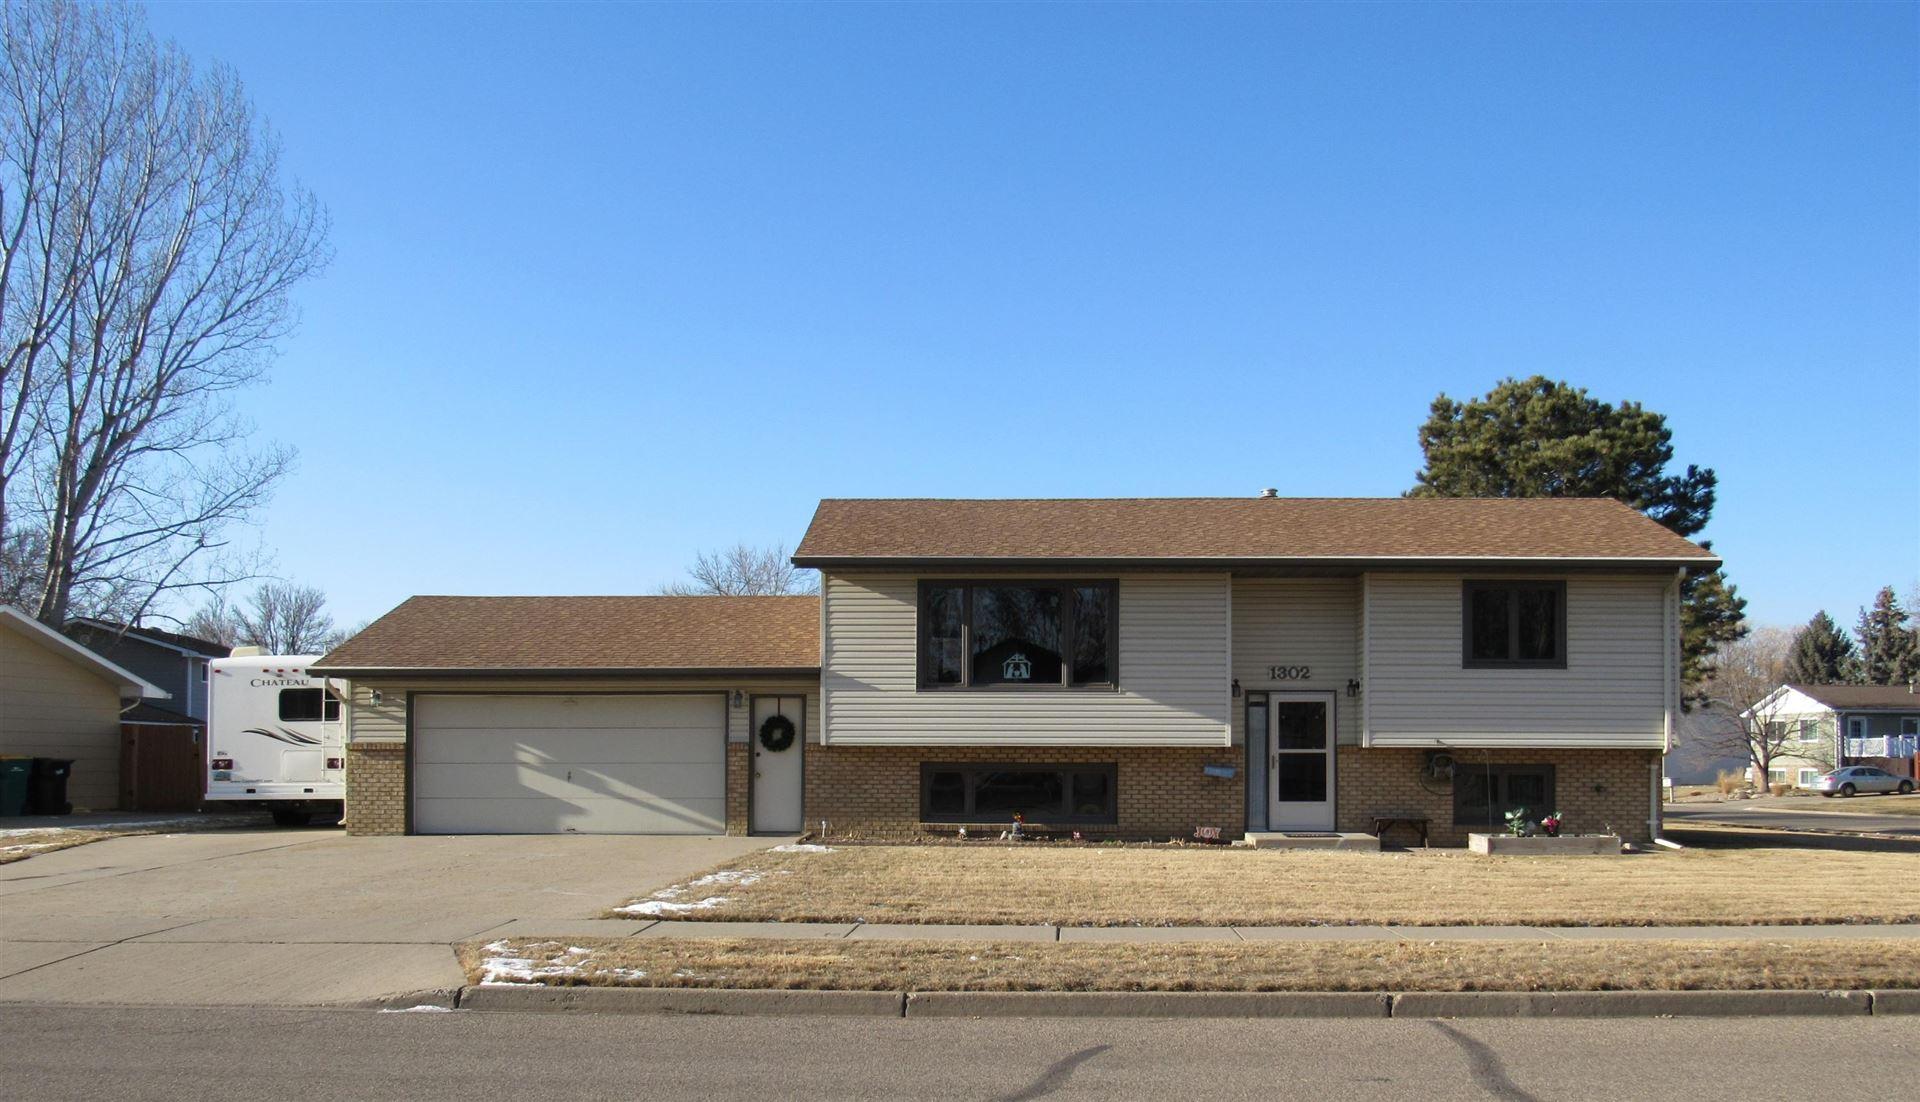 1302 Eastwood Street, Bismarck, ND 58504 - #: 409227